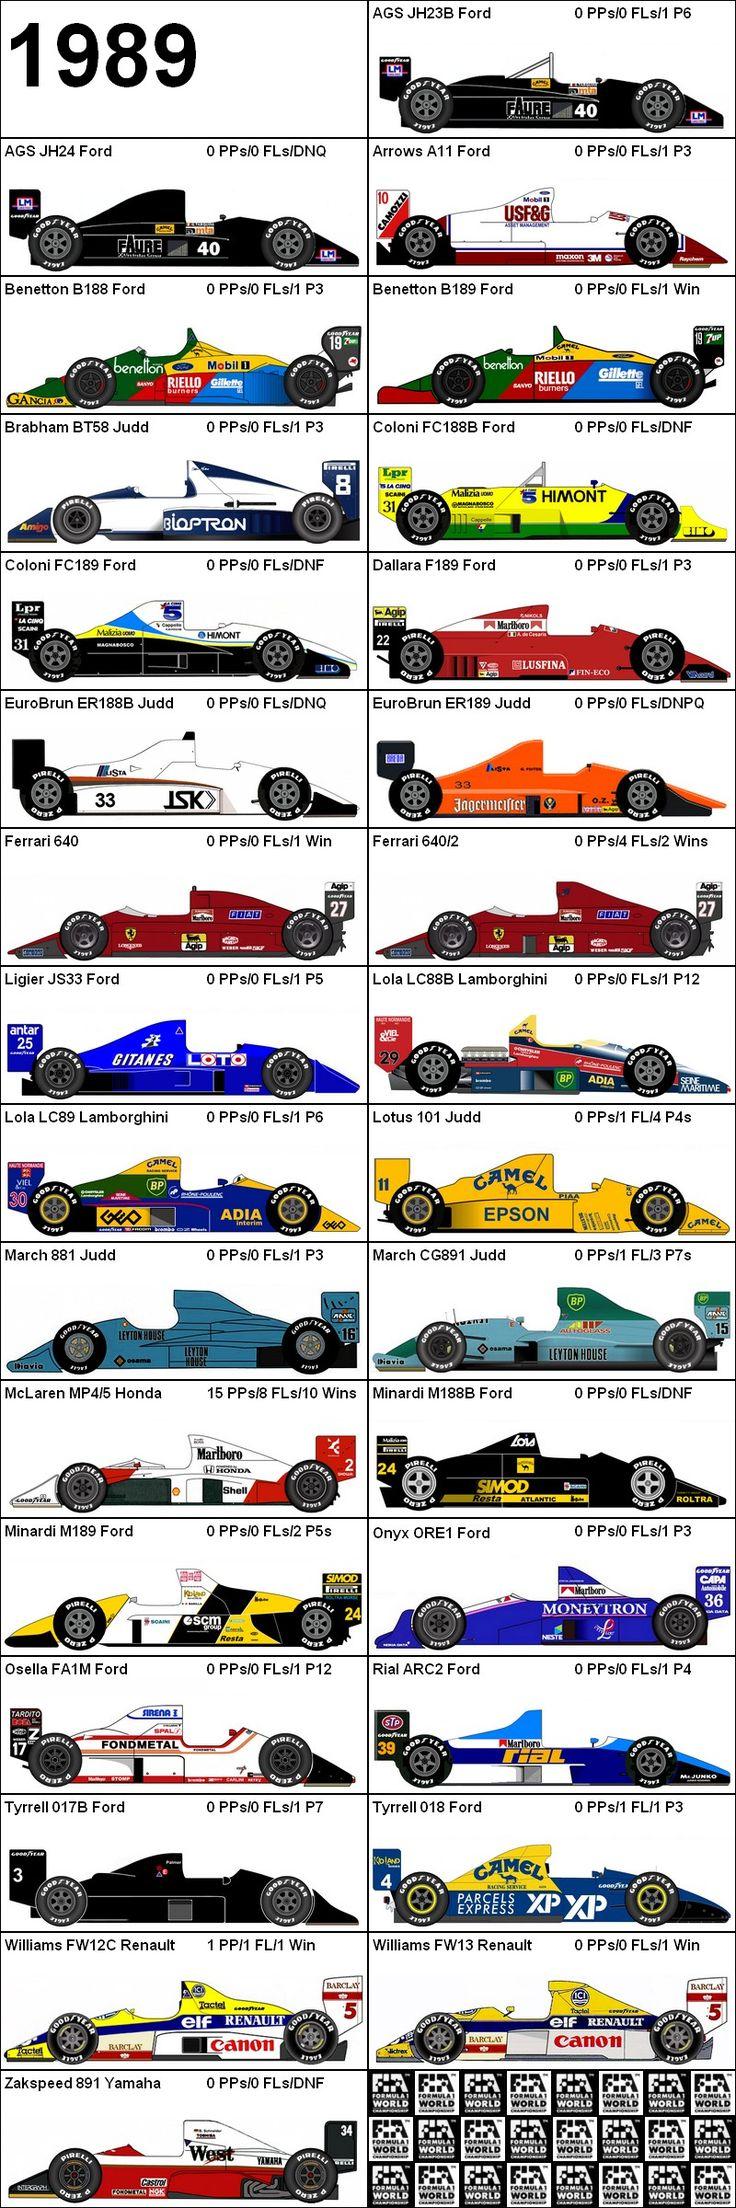 Formula One Grand Prix 1989 Cars